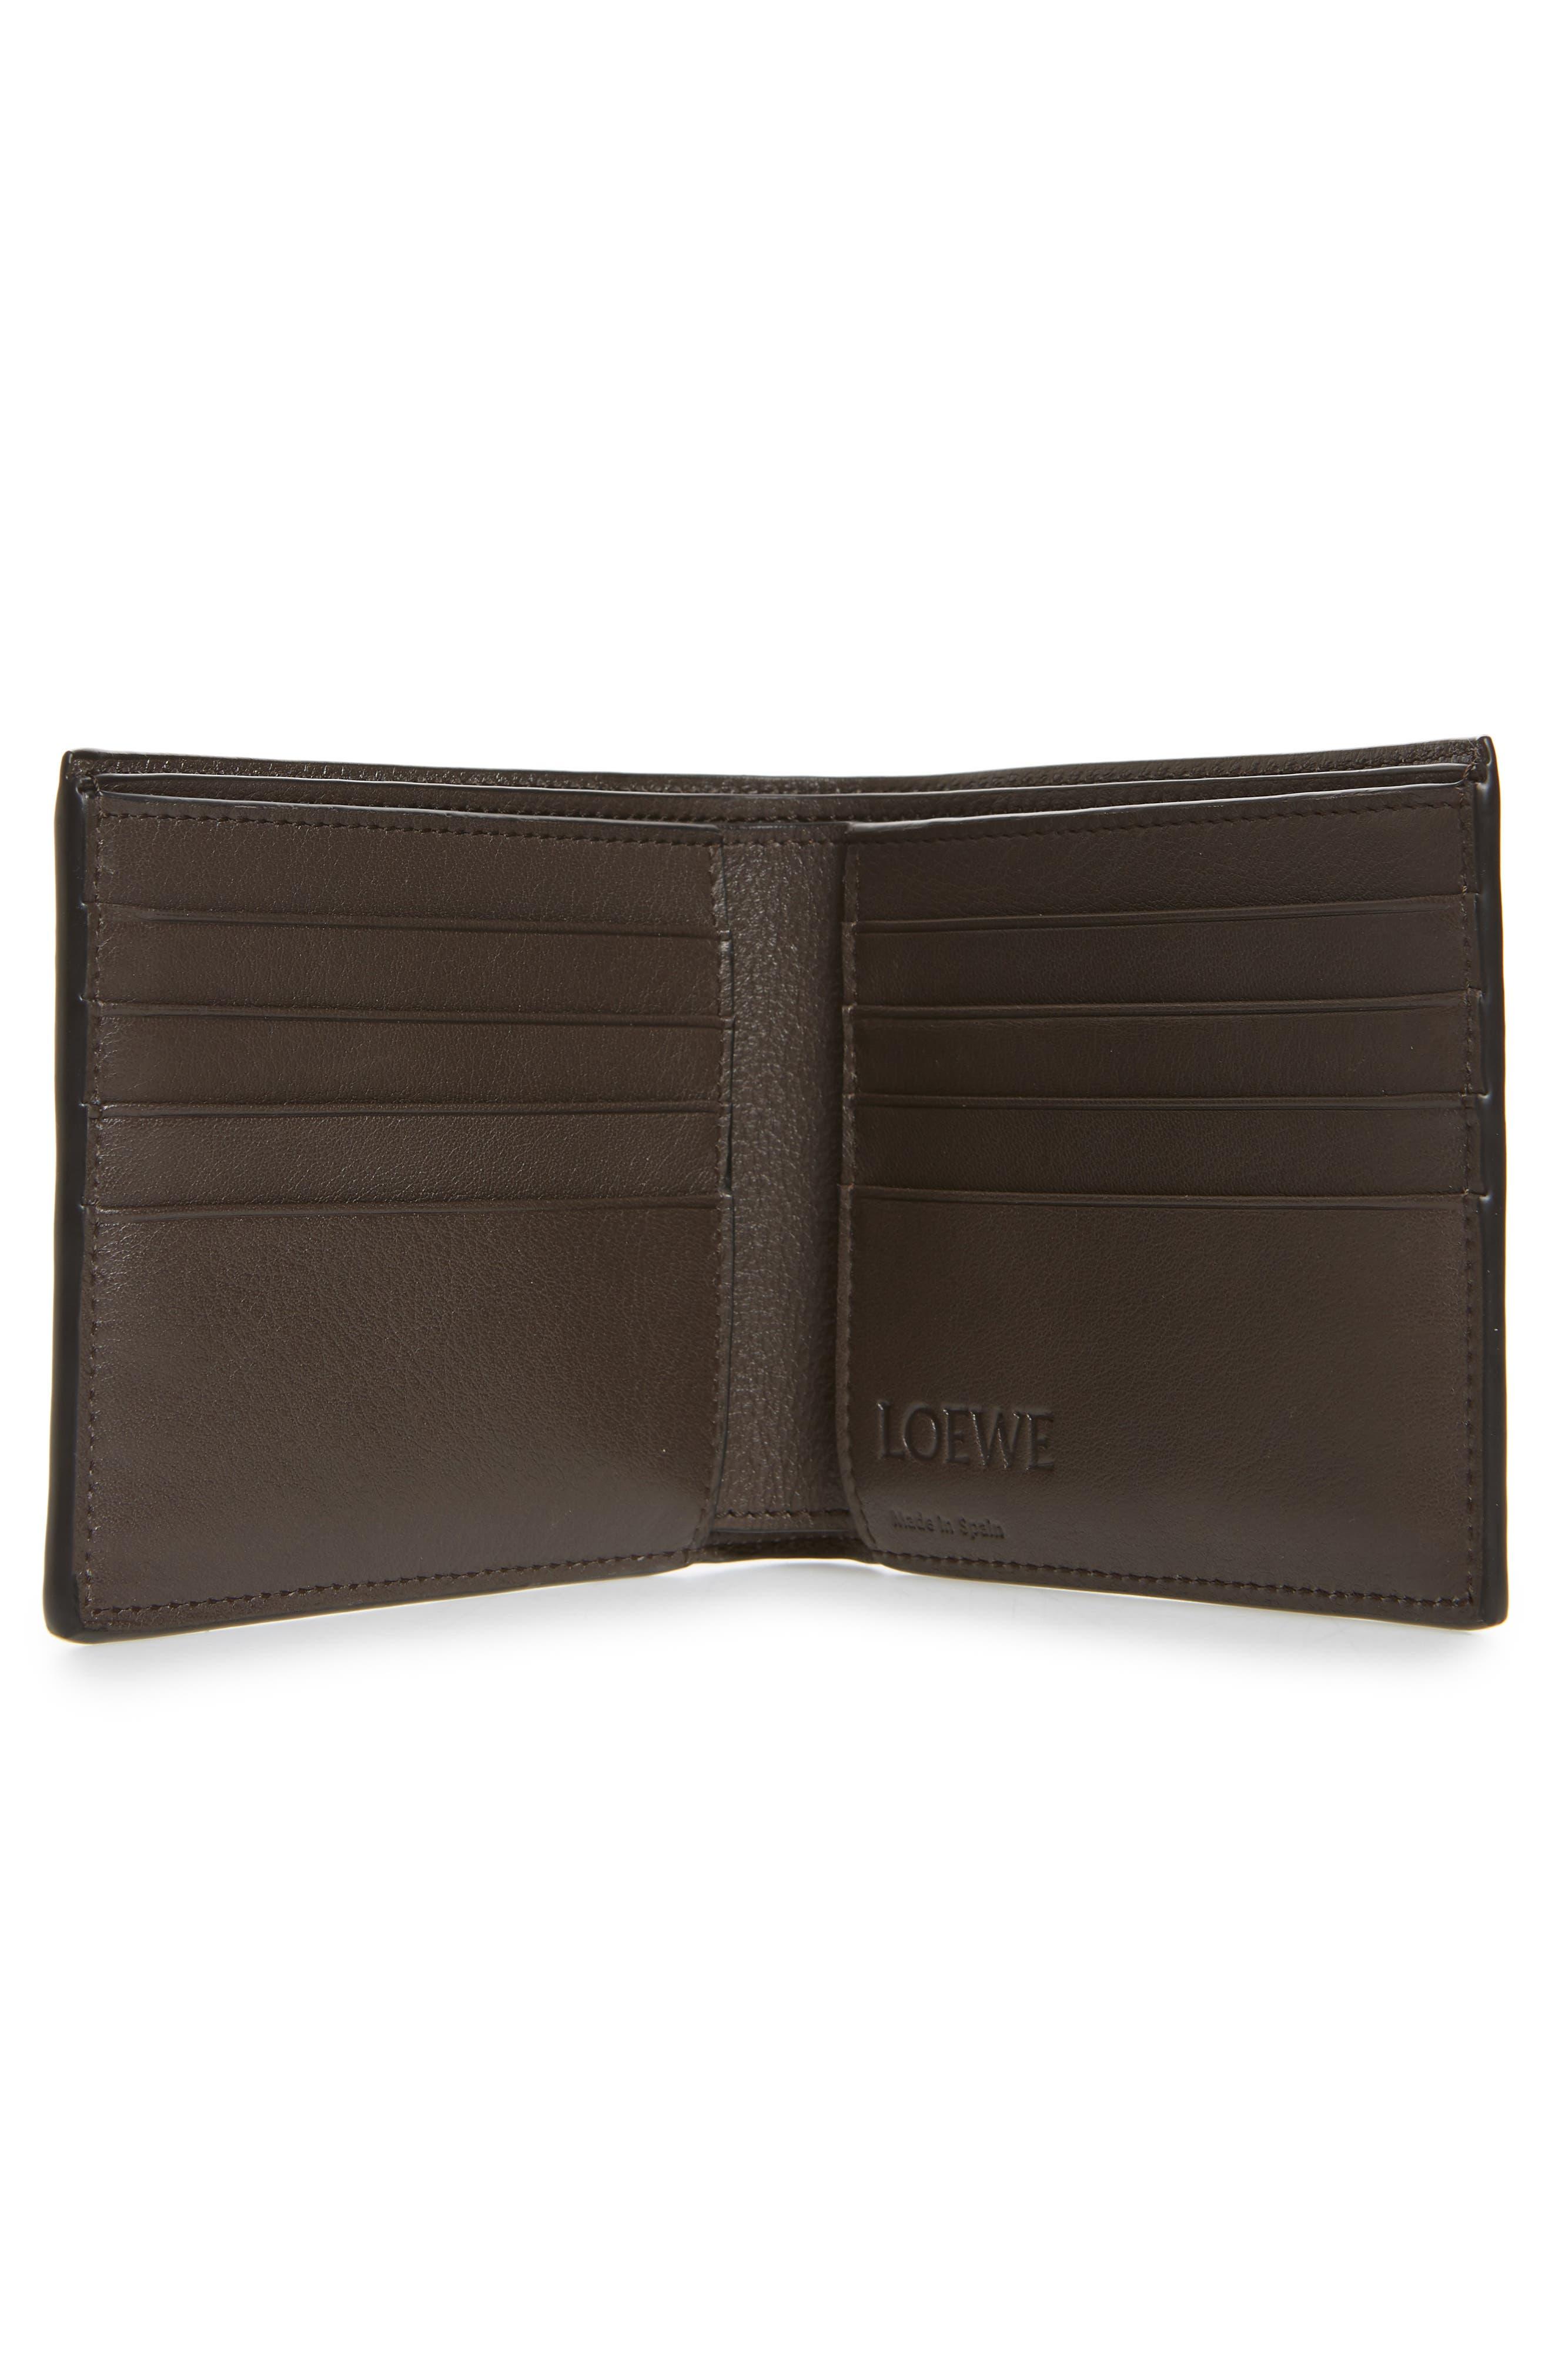 LOEWE,                             Calfskin Leather Bifold Wallet,                             Alternate thumbnail 2, color,                             MIDNIGHT